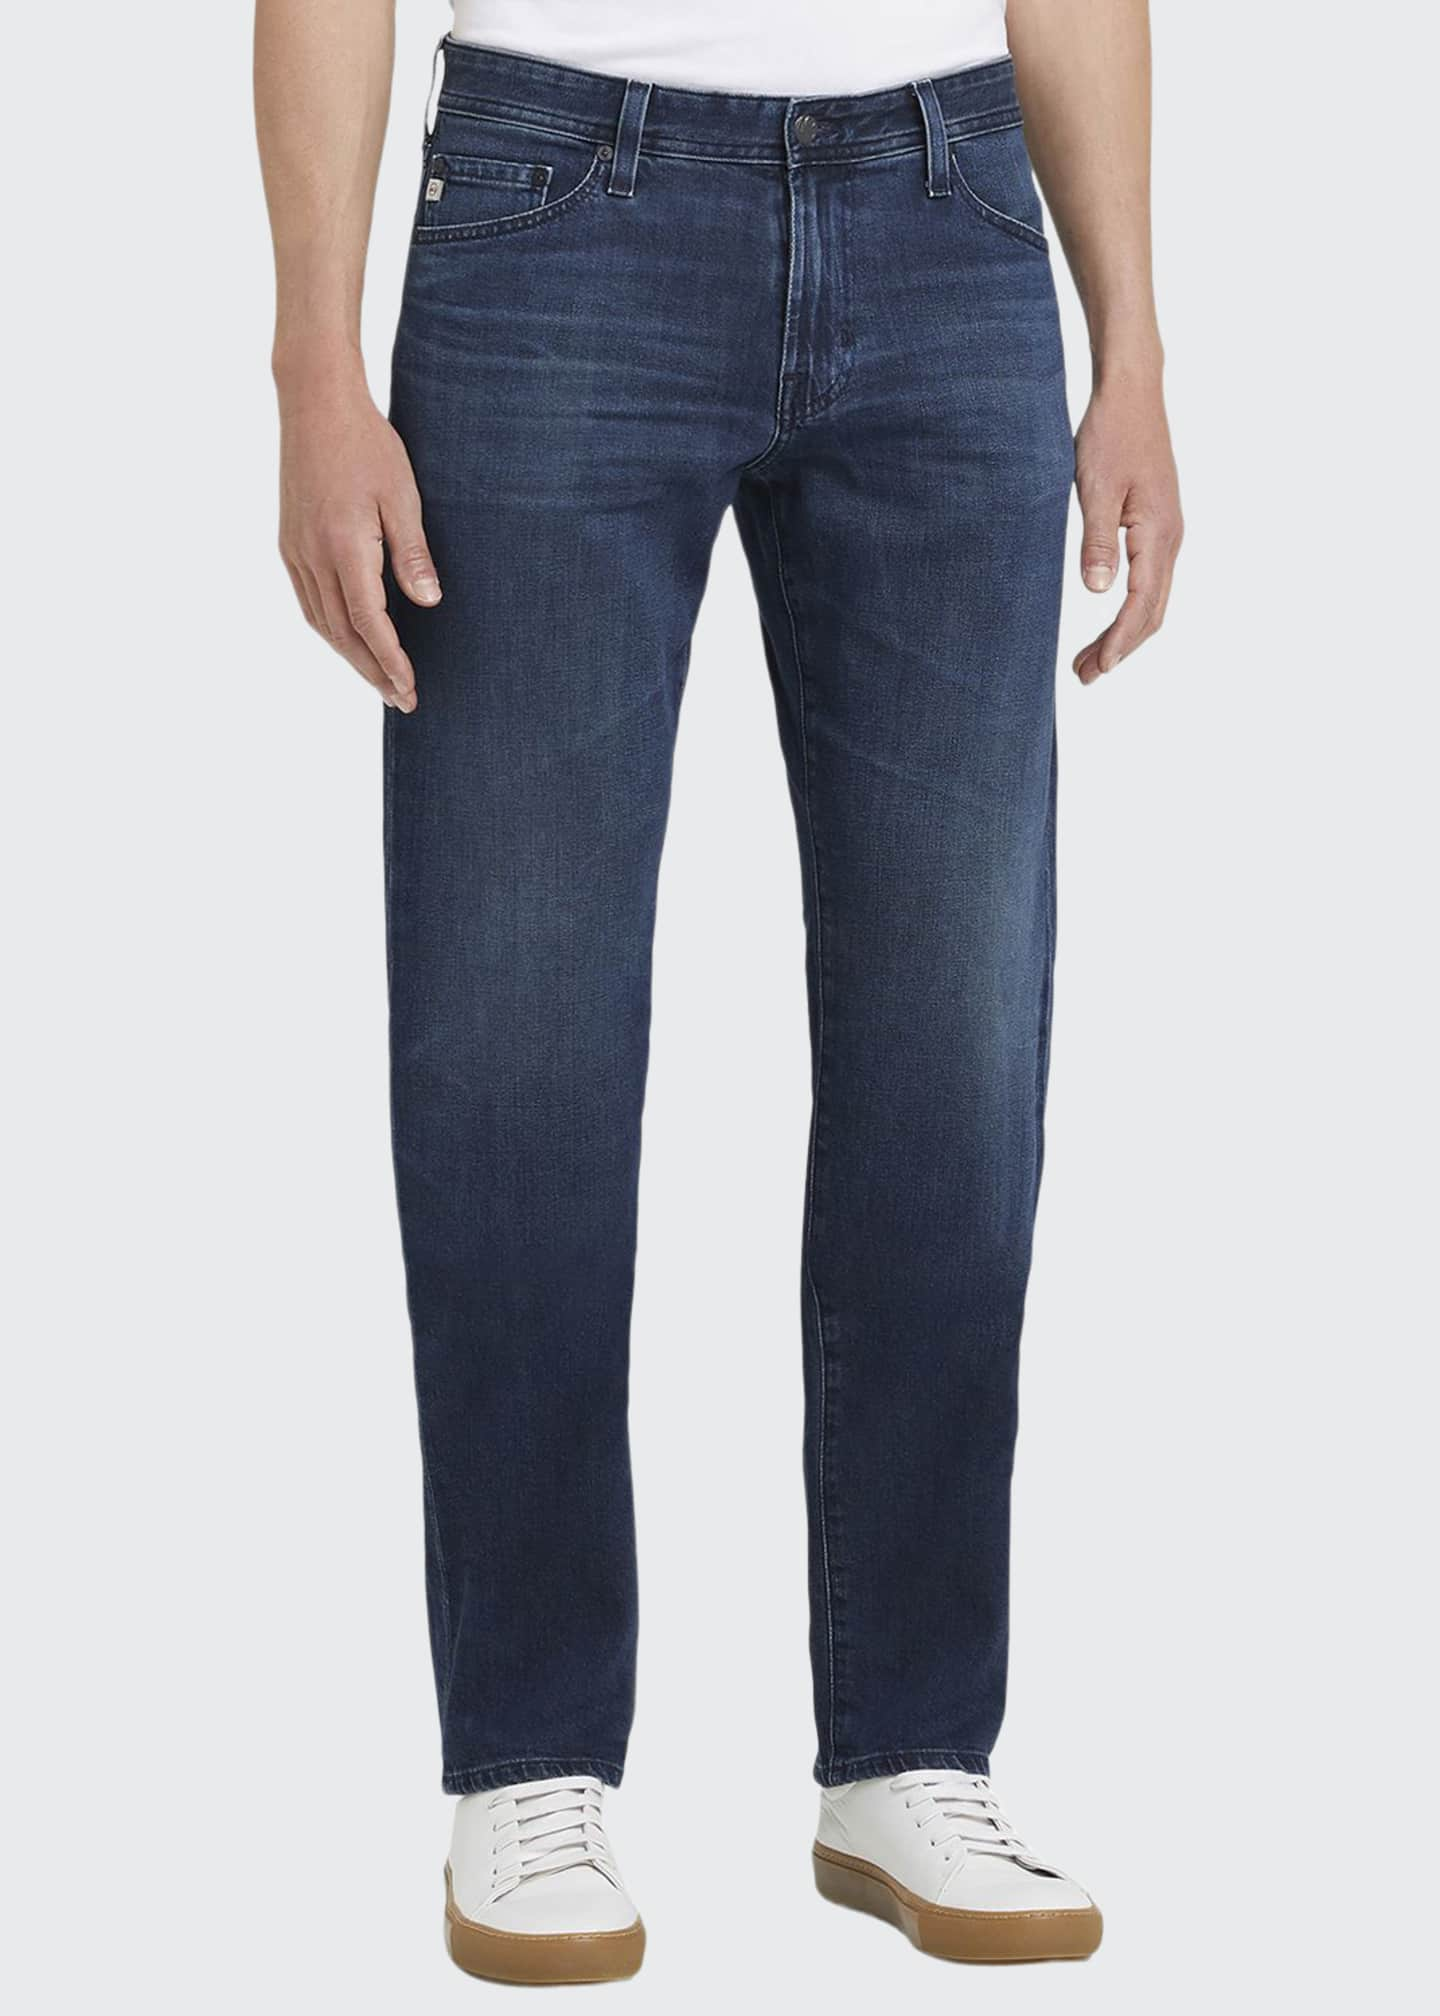 AG Adriano Goldschmied Graduate Das Straight-Leg Jeans